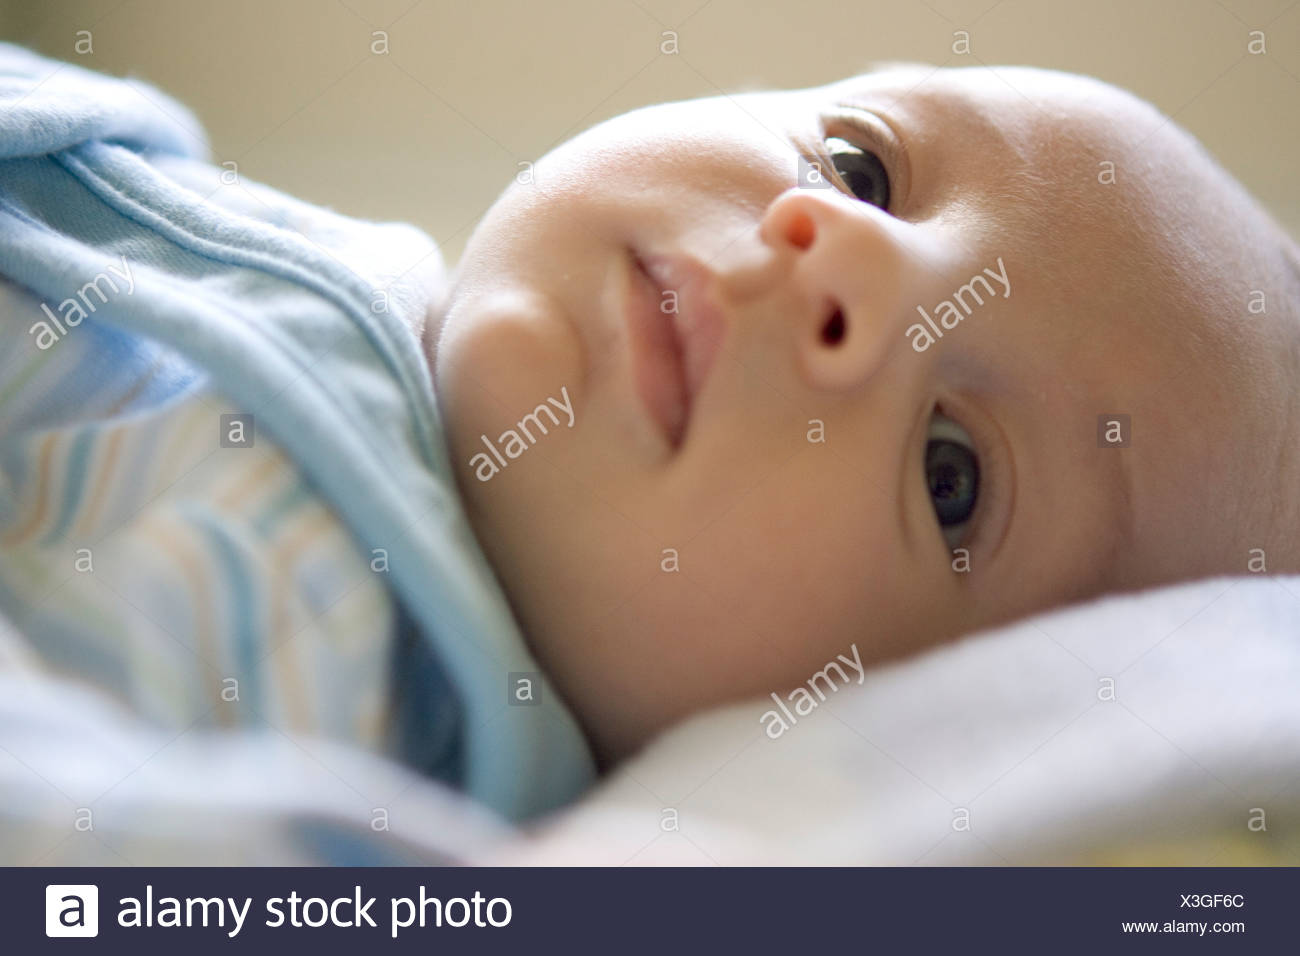 Close up of newborn's face - Stock Image